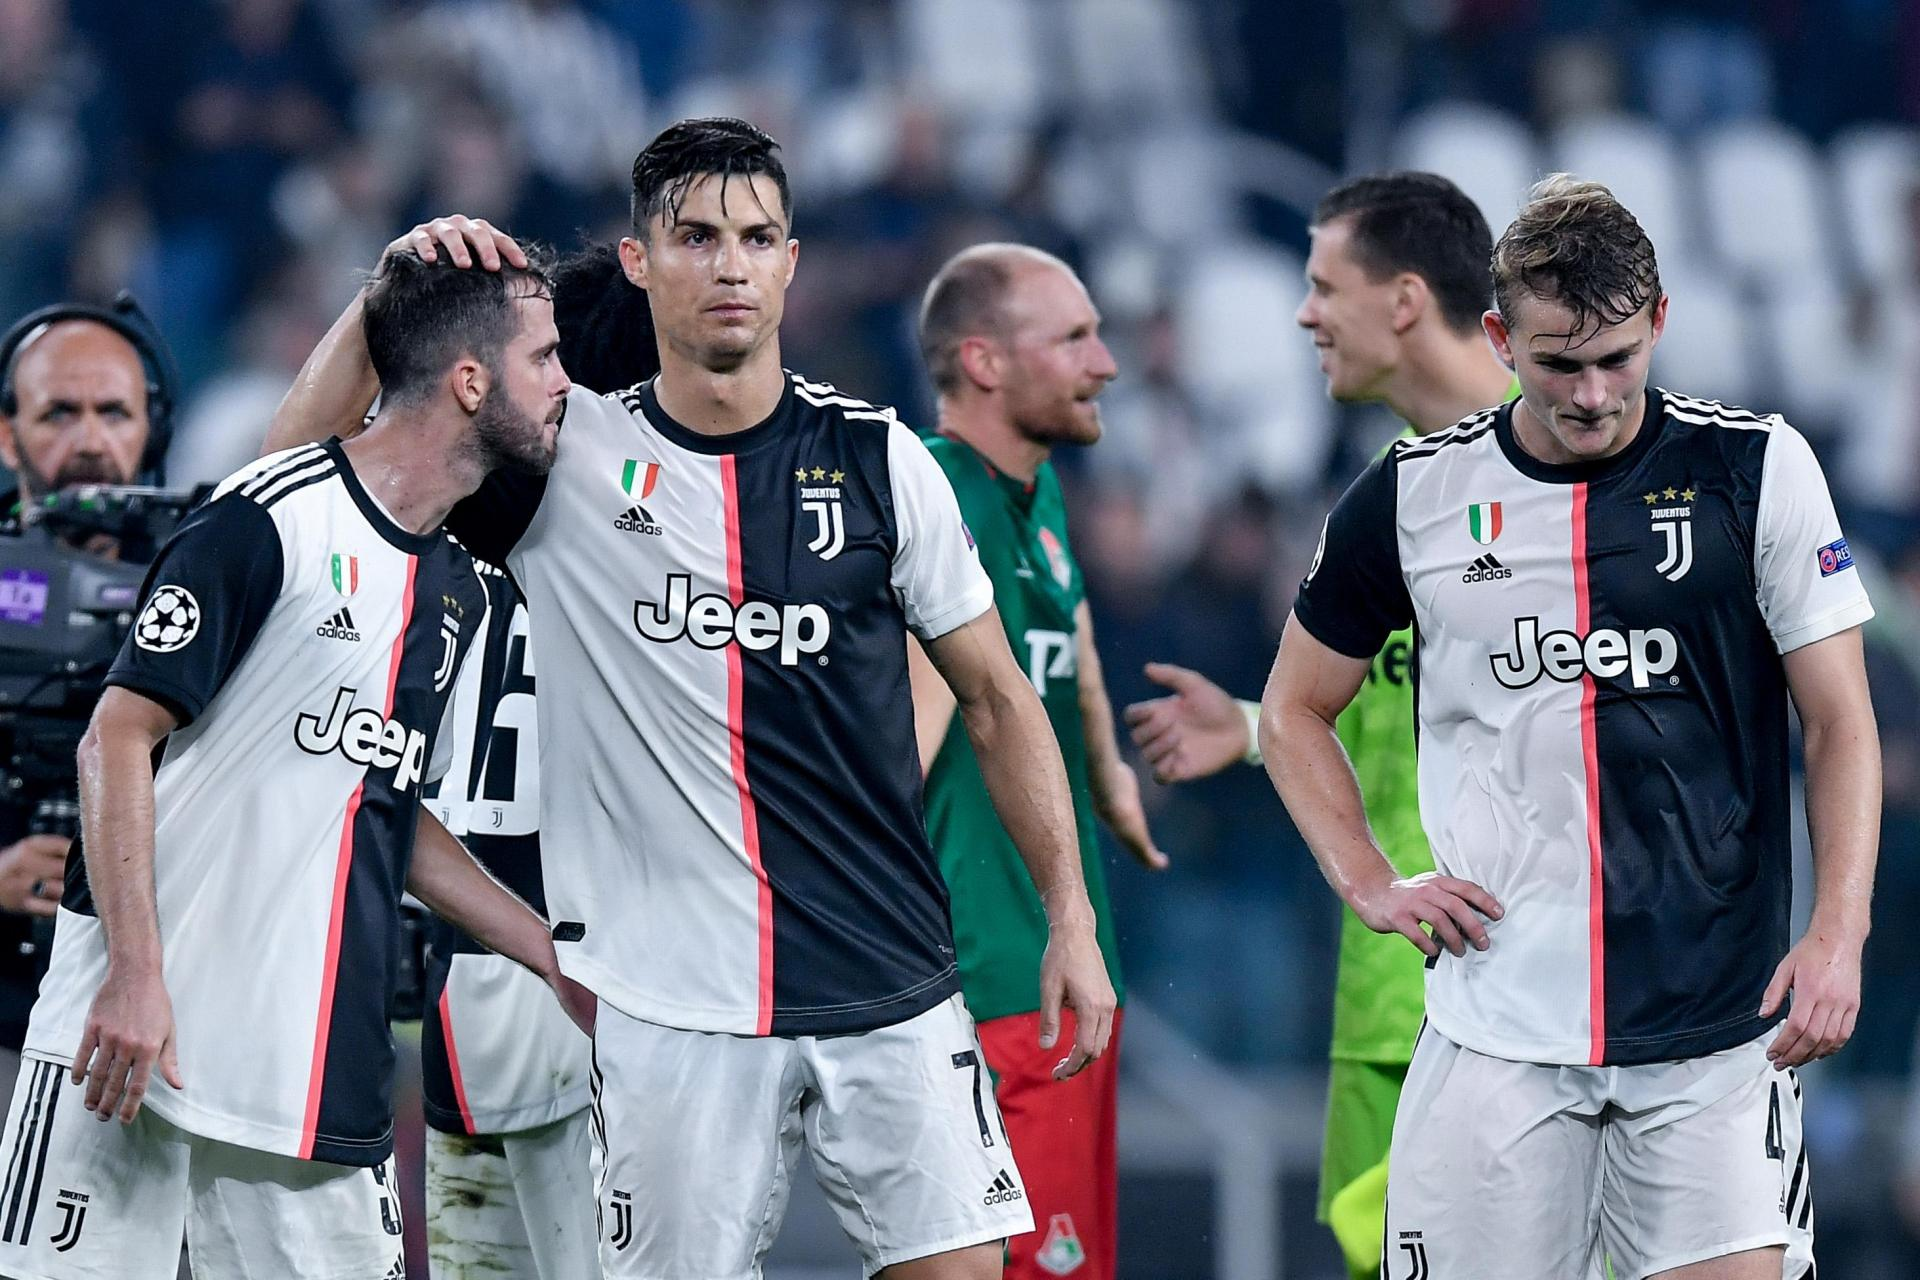 Juventus Seek 300m Euros Boost To Keep Up With European Rivals